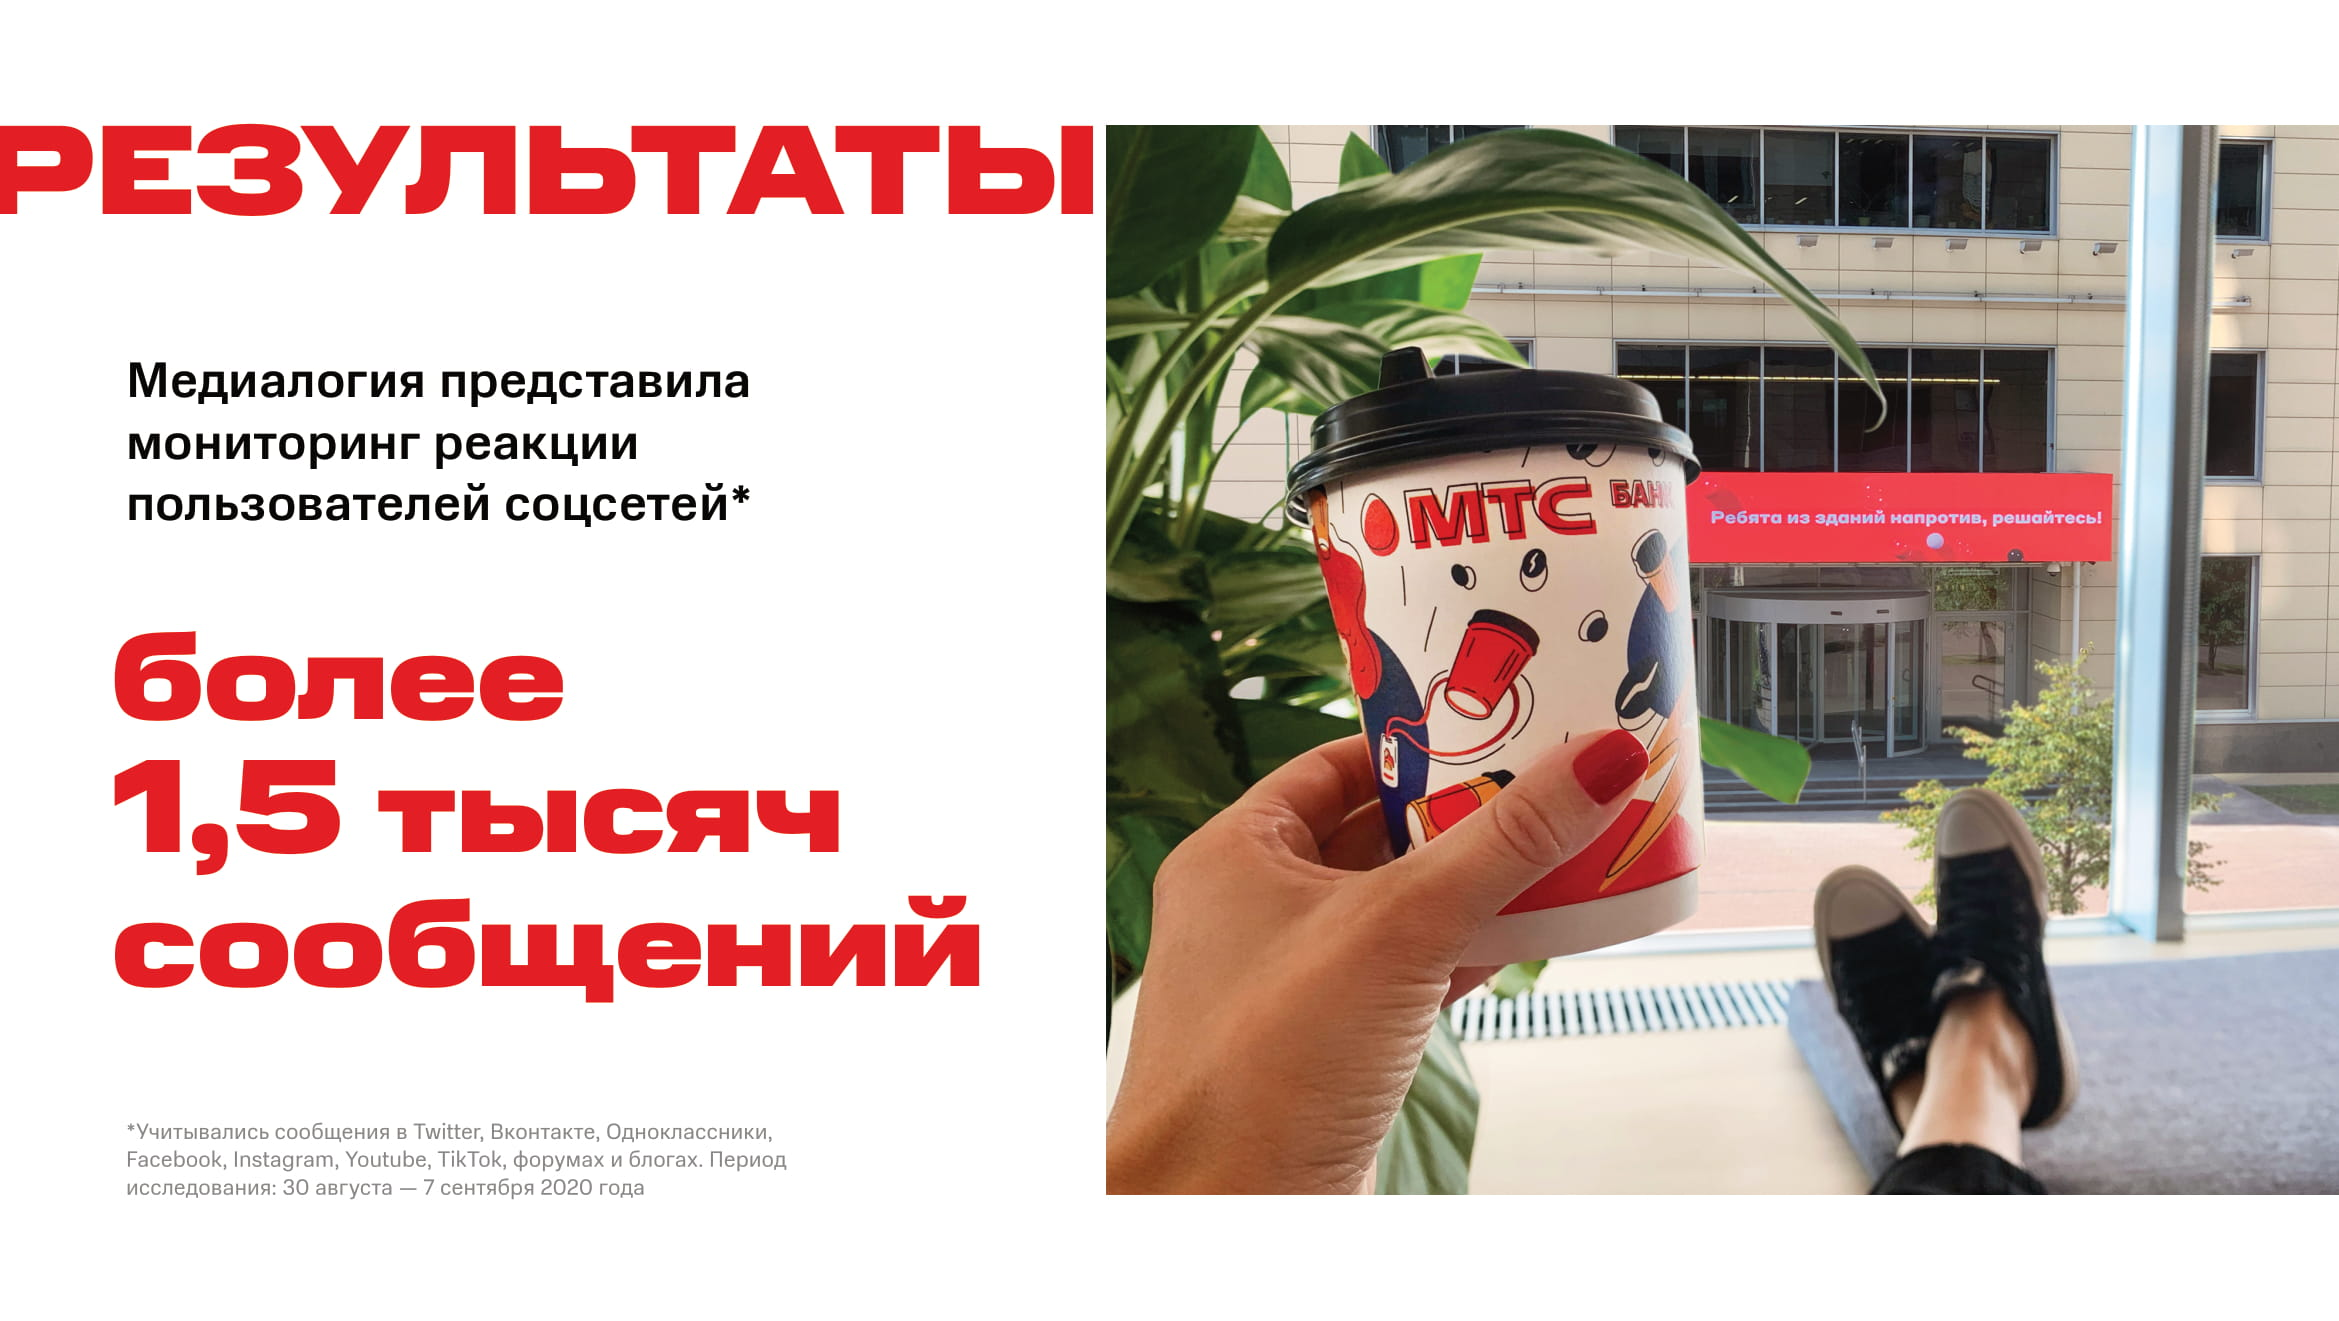 RFA_Креатив-года-2020_МТС-Банк-VS-Альфа-Банк-11